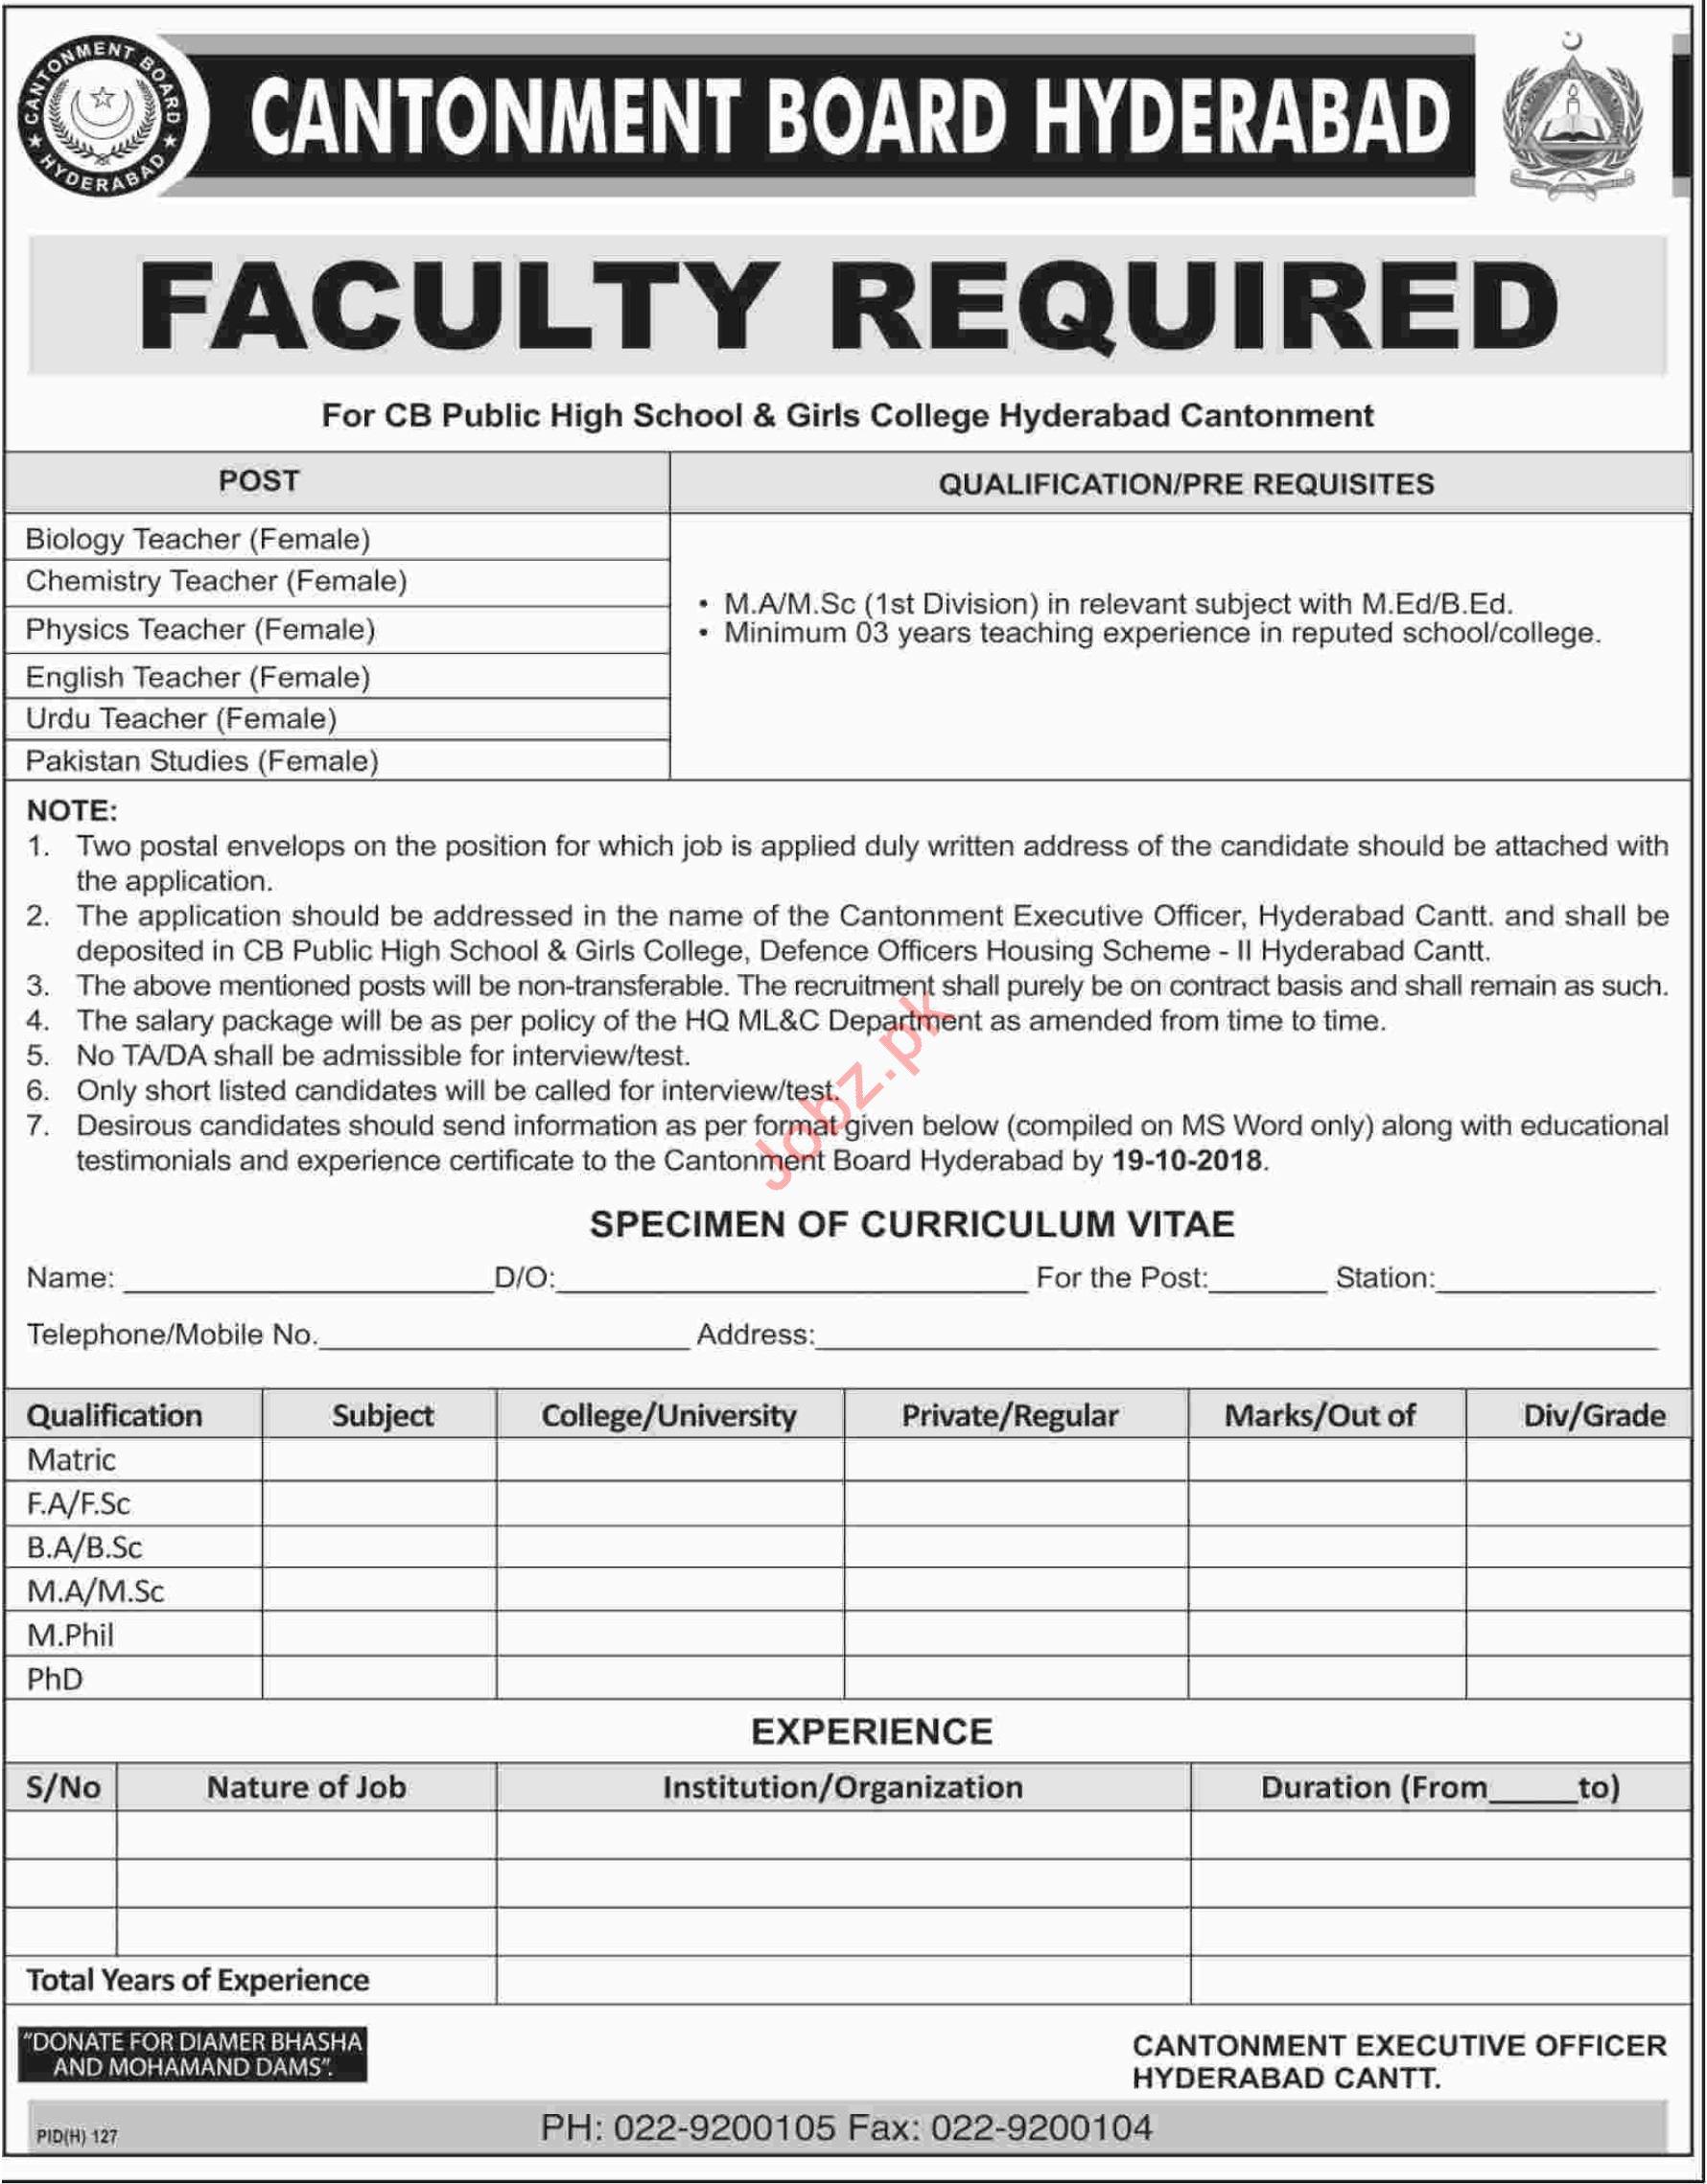 CB Public High School & Girls College Hyderabad Teacher Jobs